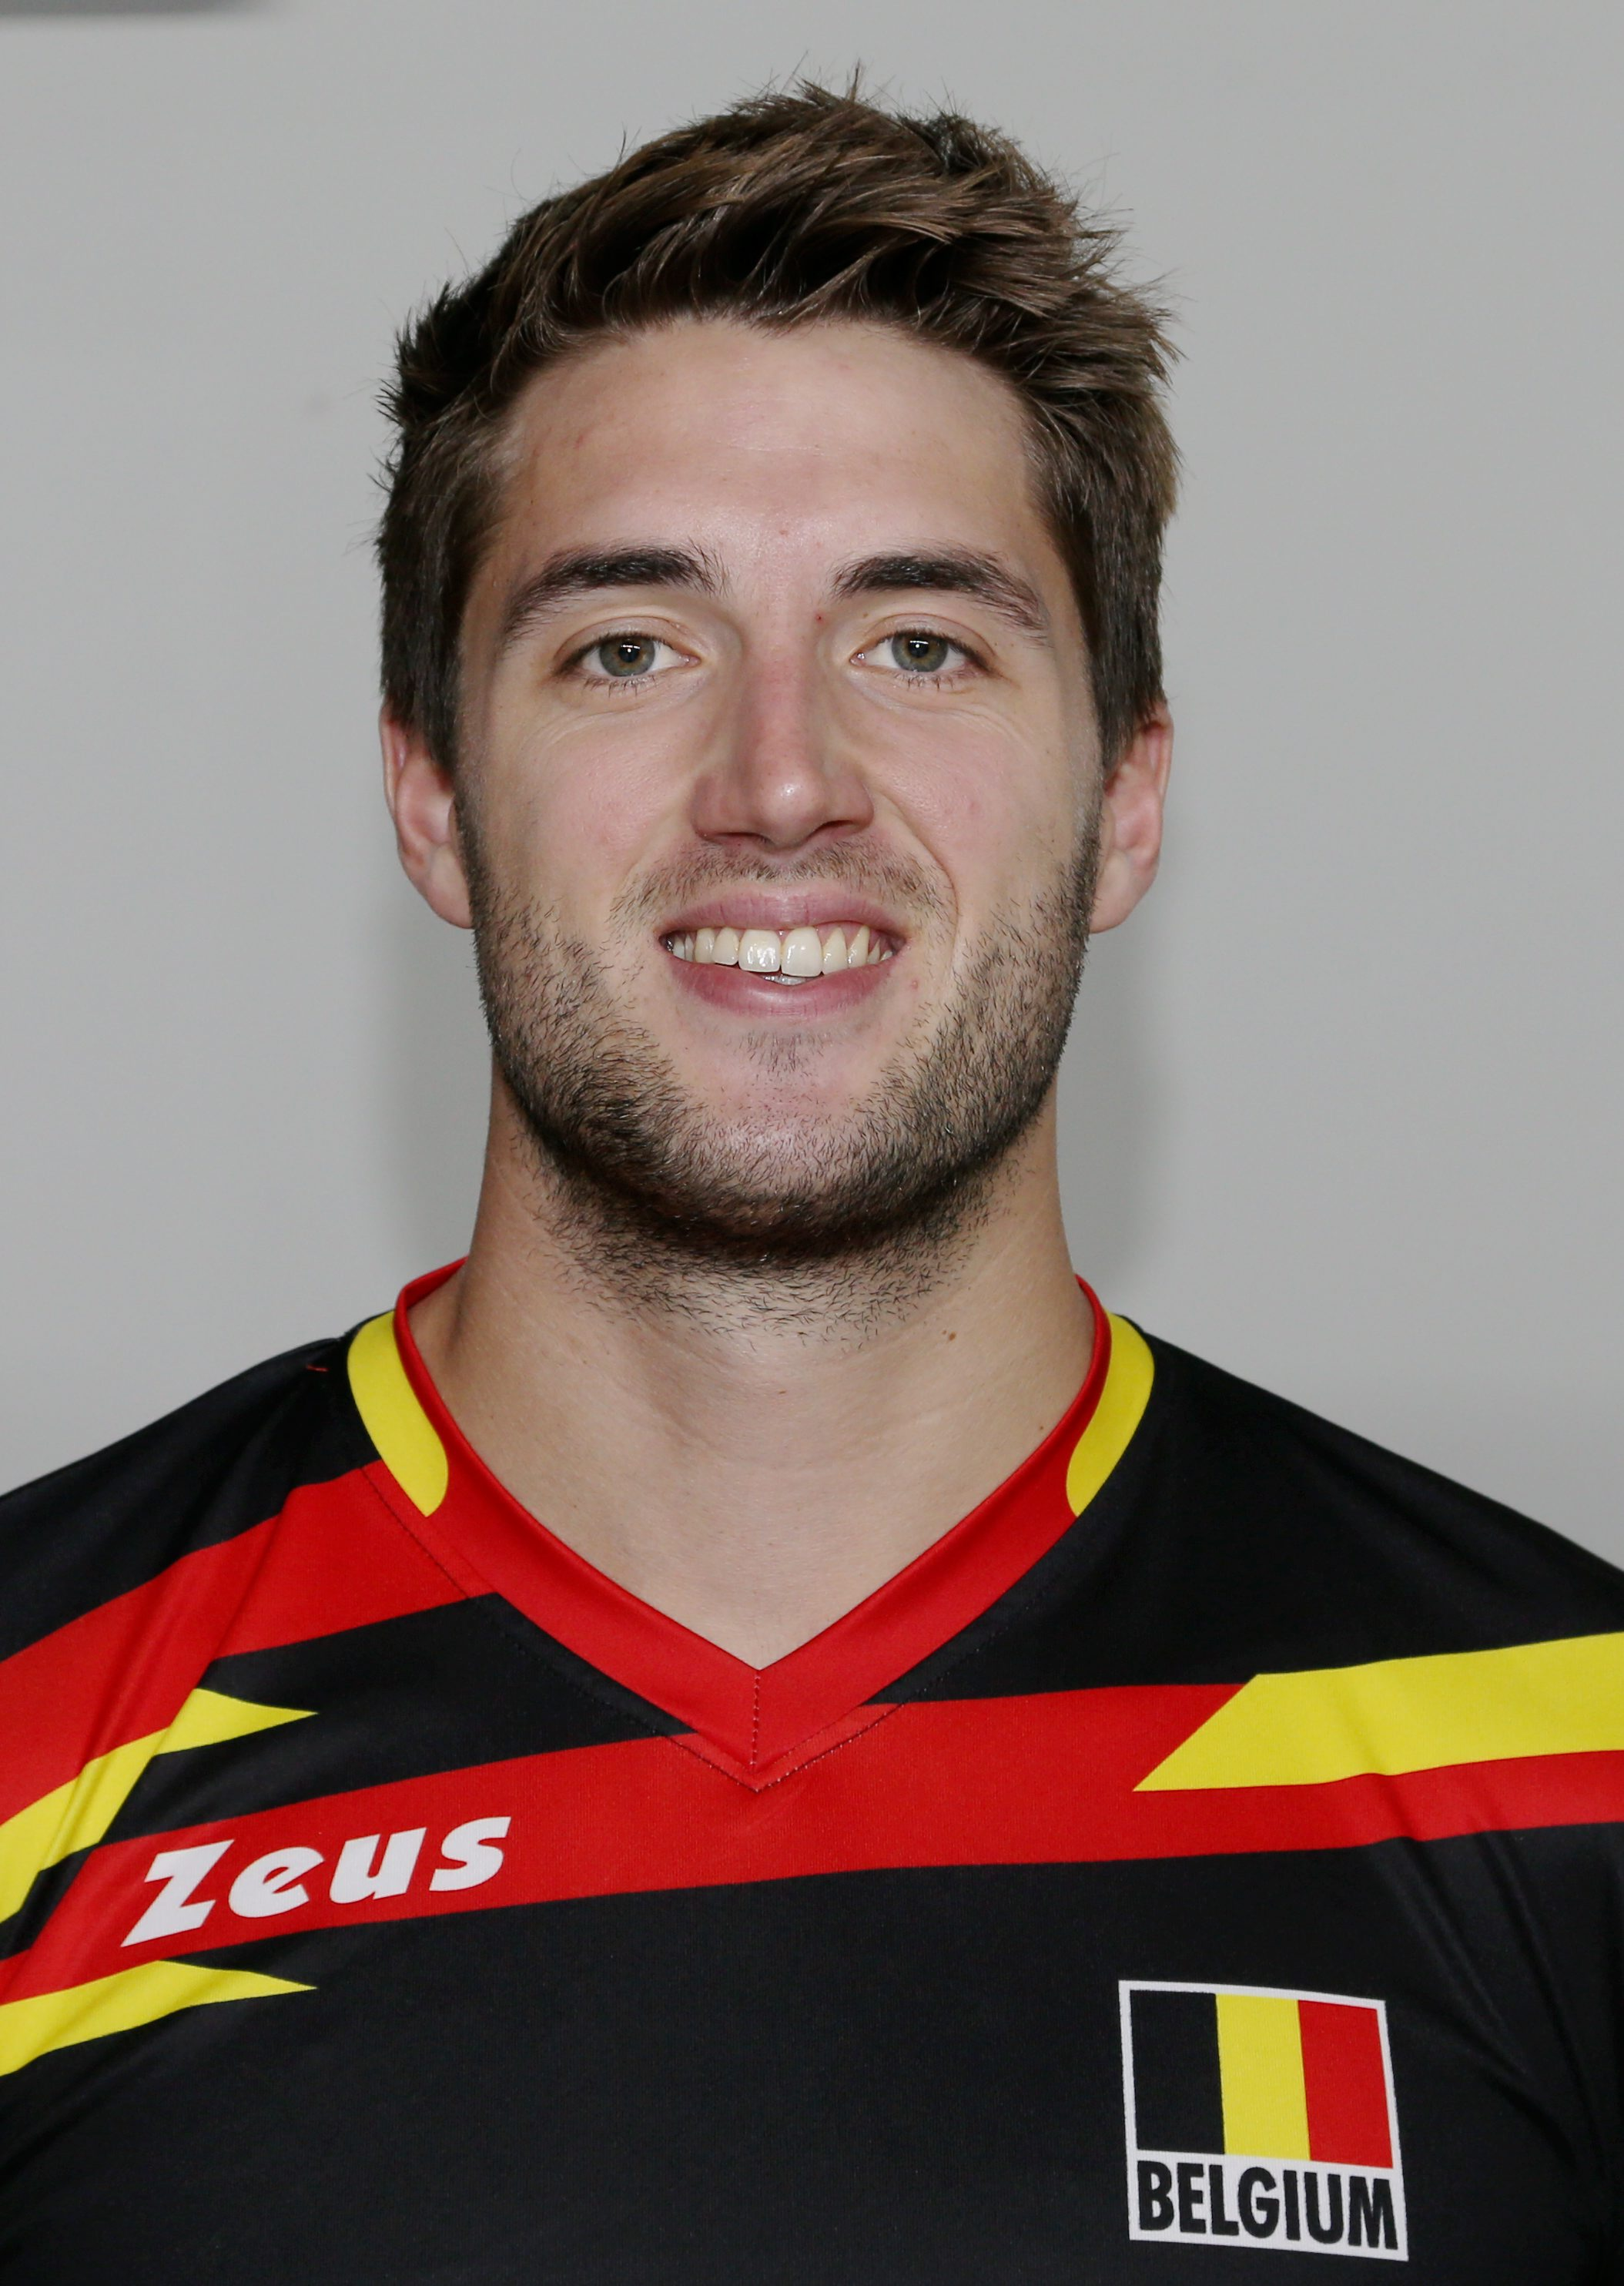 Pieter Coolman